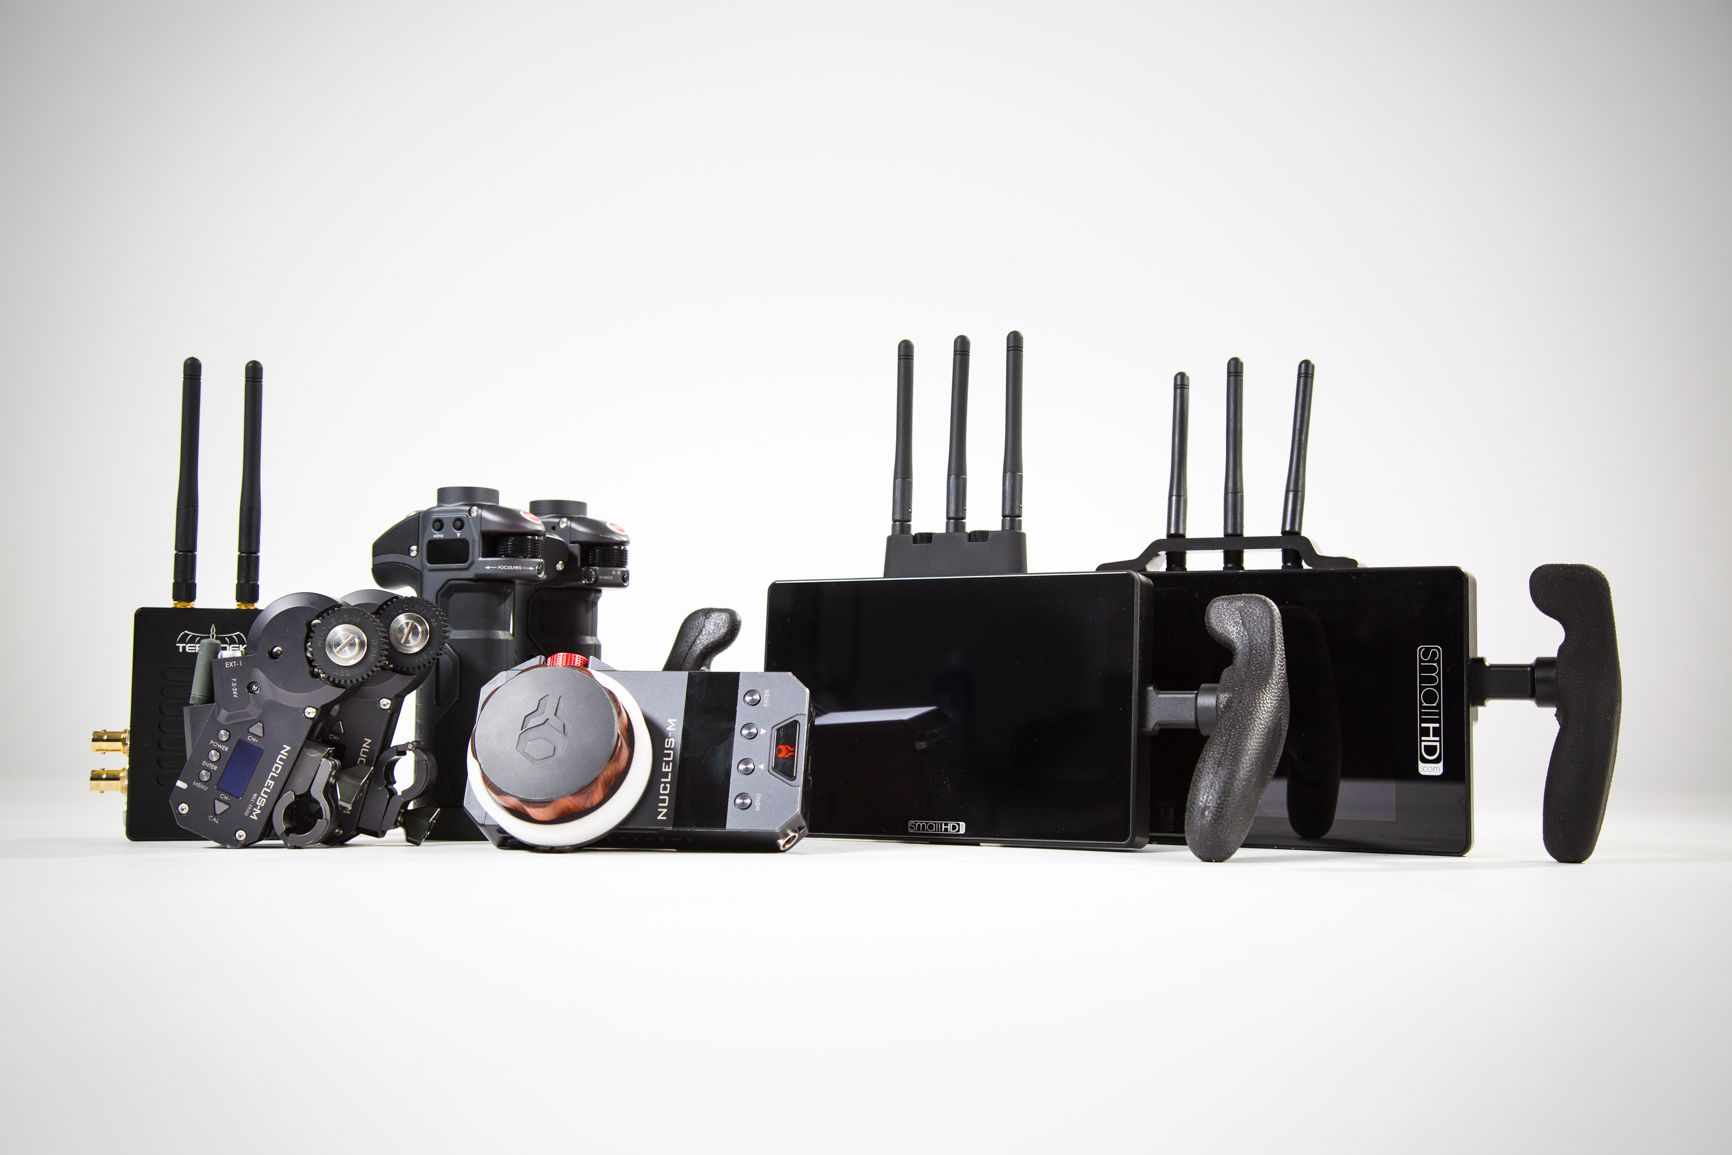 Tilta Nucleus M, SmallHD Cine 7, SmallHD 703 & Teradek 500 Transmitter Kit